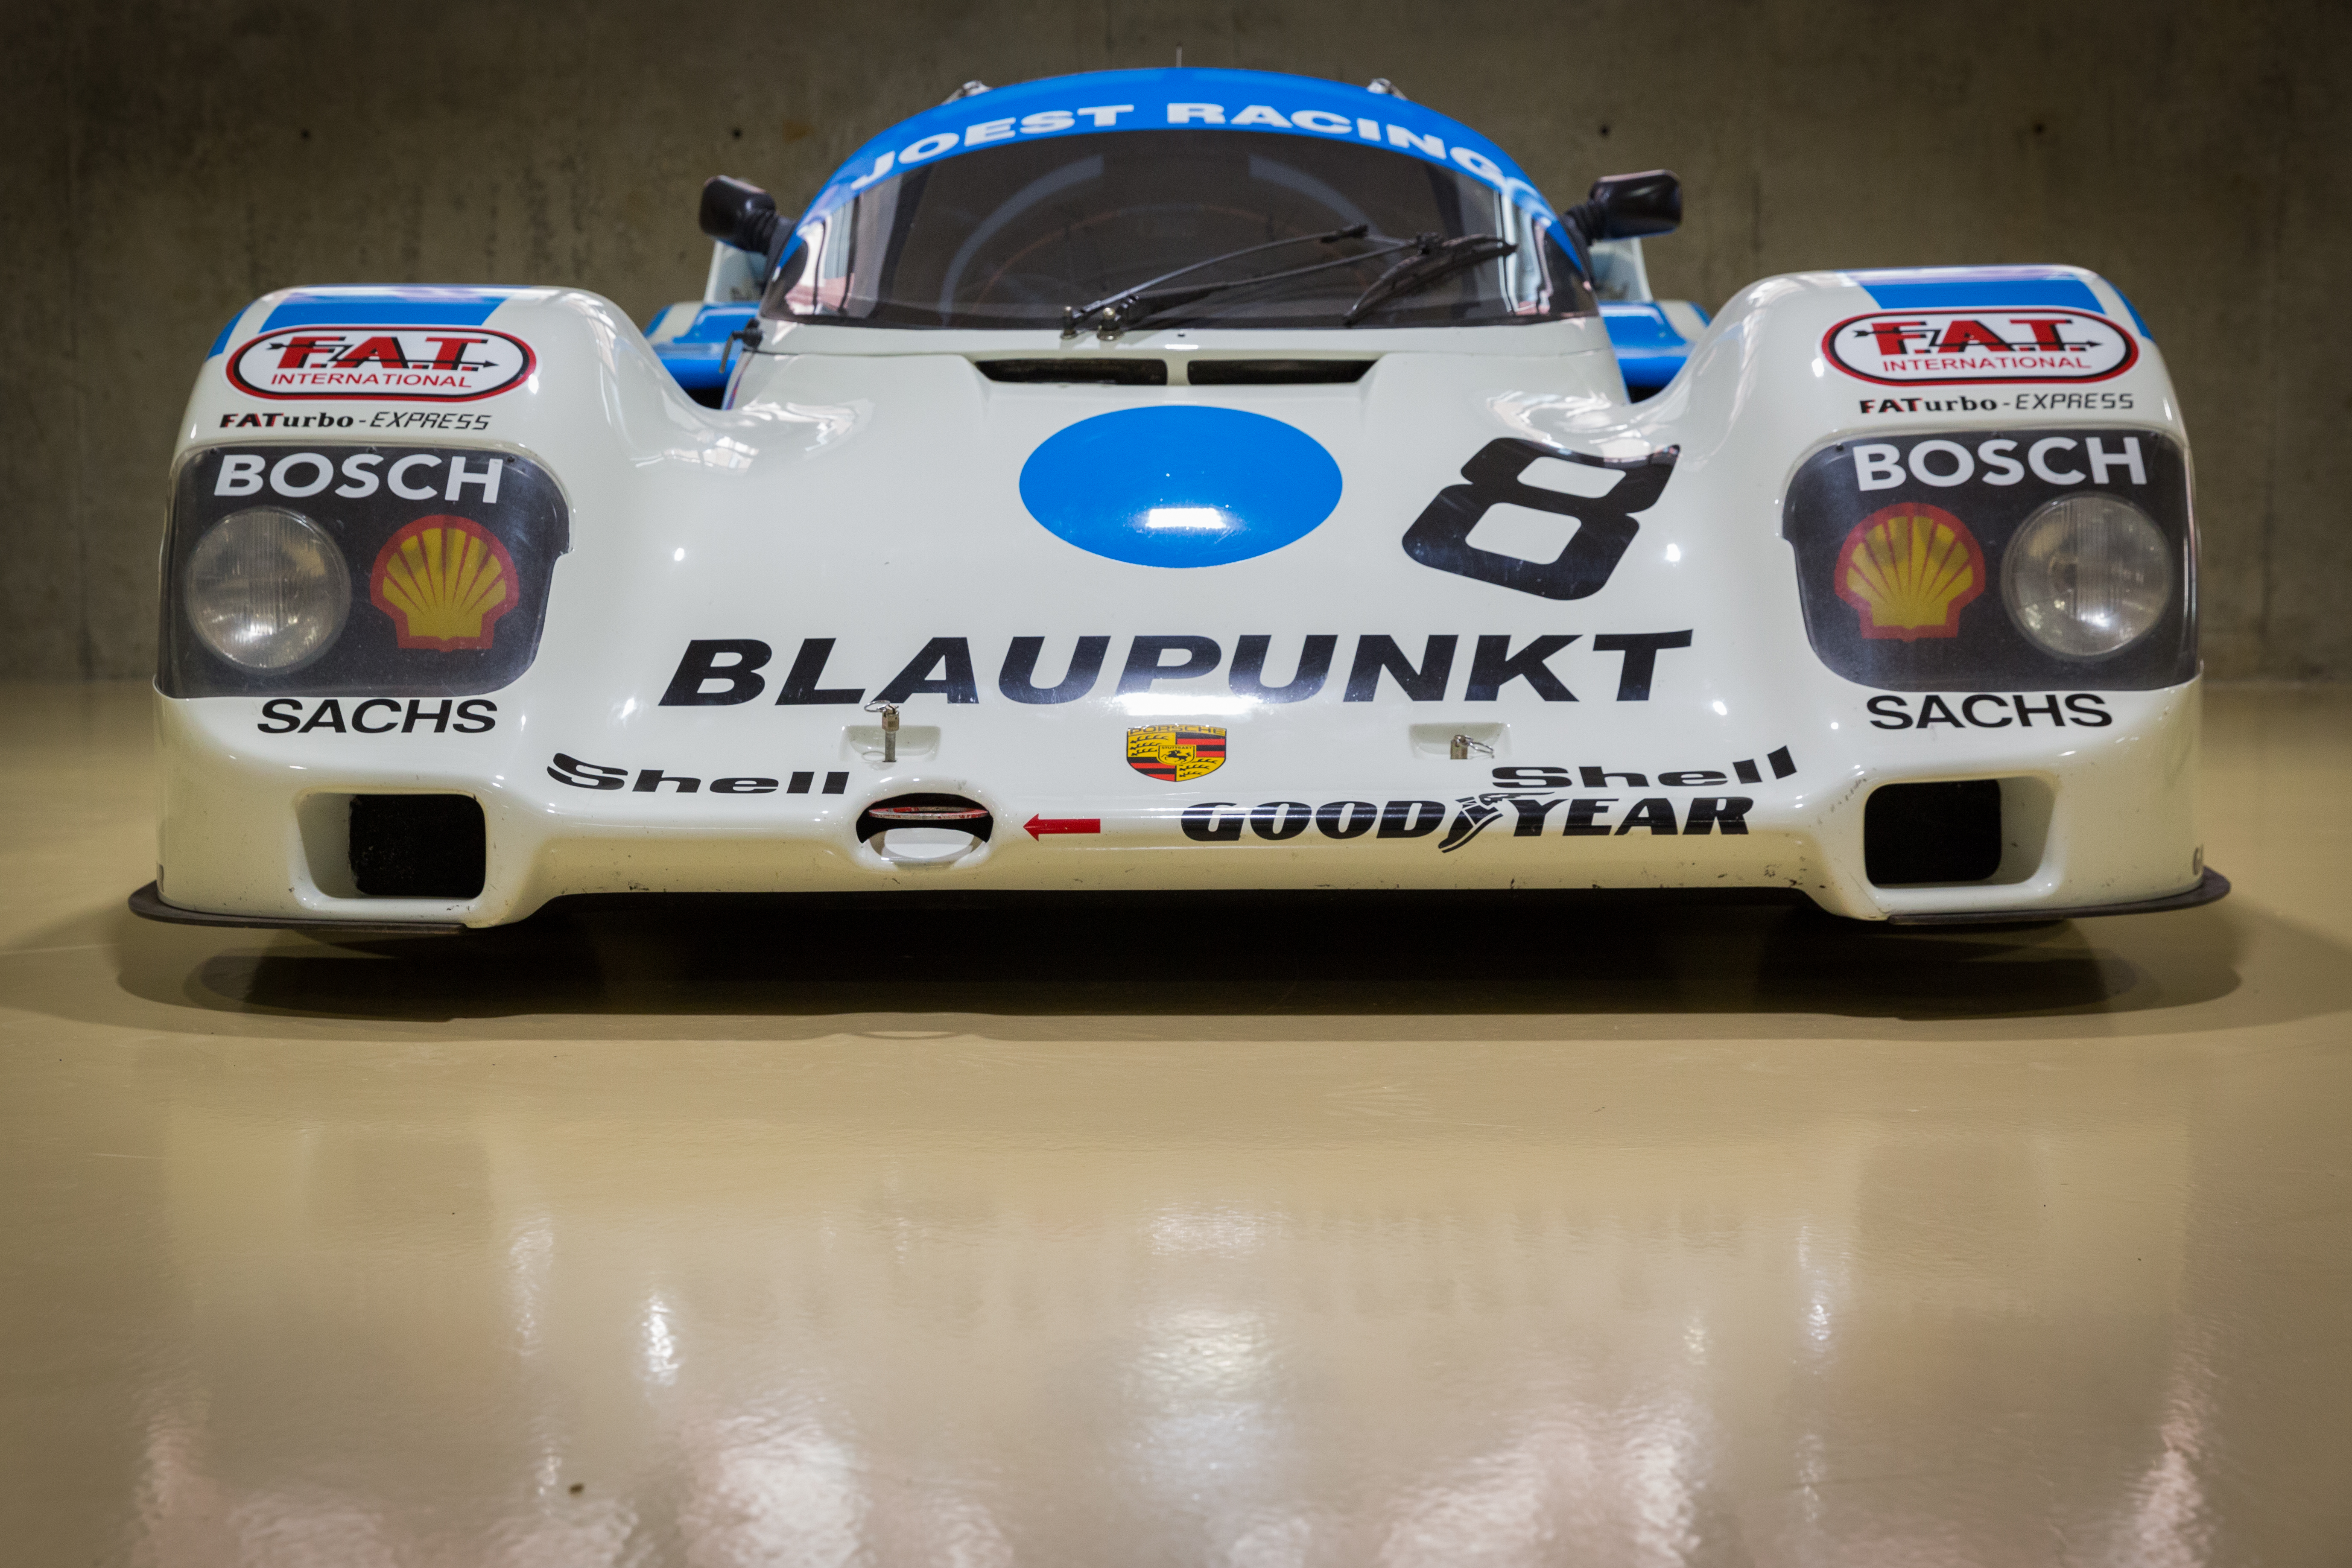 Porsche 962 race car